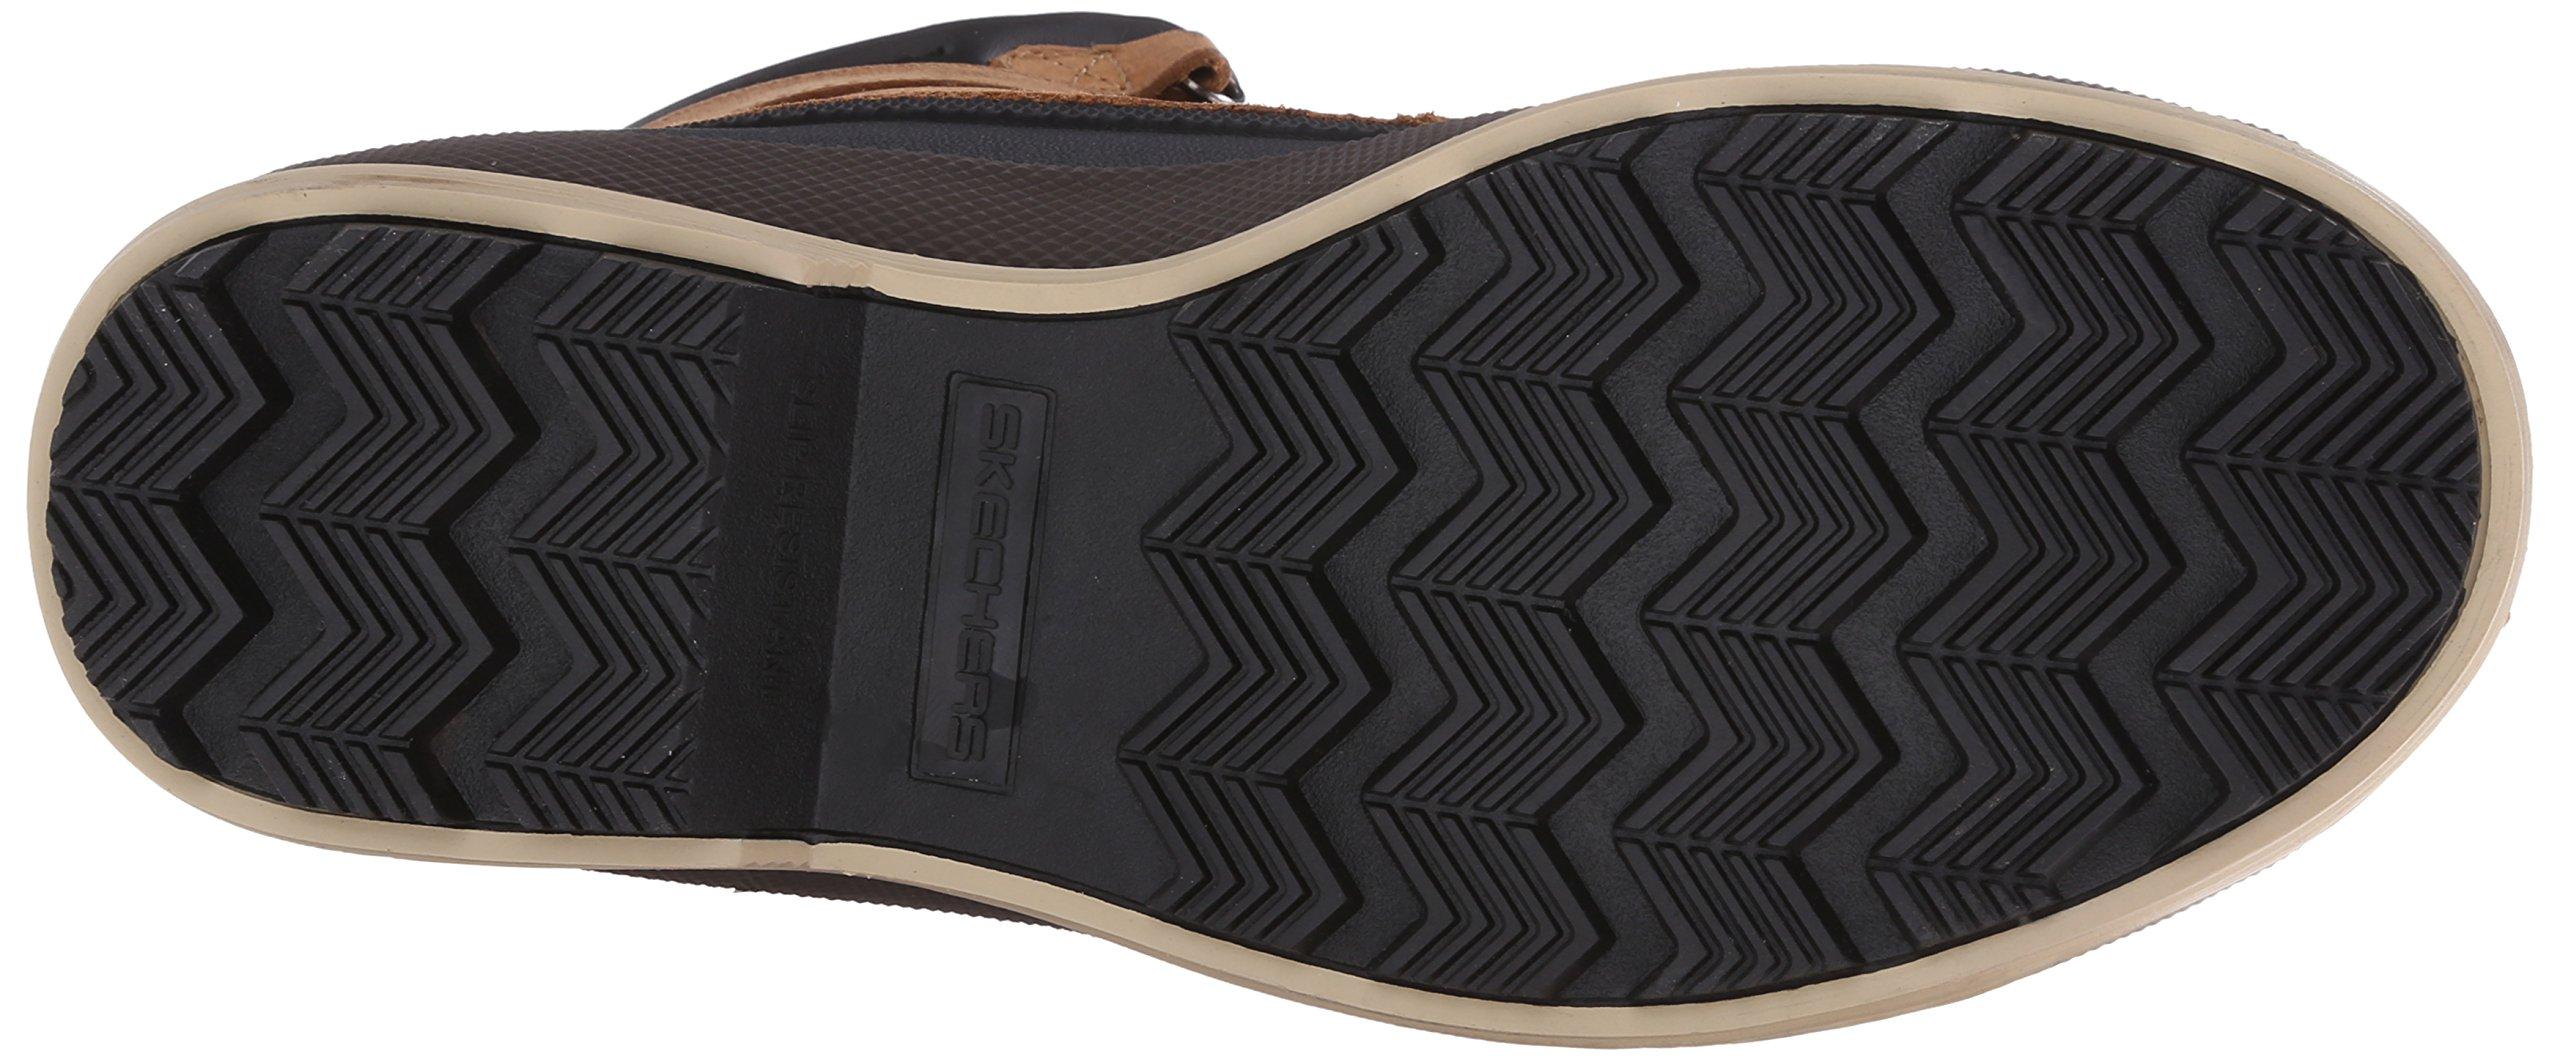 Skechers for Work Women's Duck Rain Boot, Brown, 5.5 M US by Skechers (Image #3)